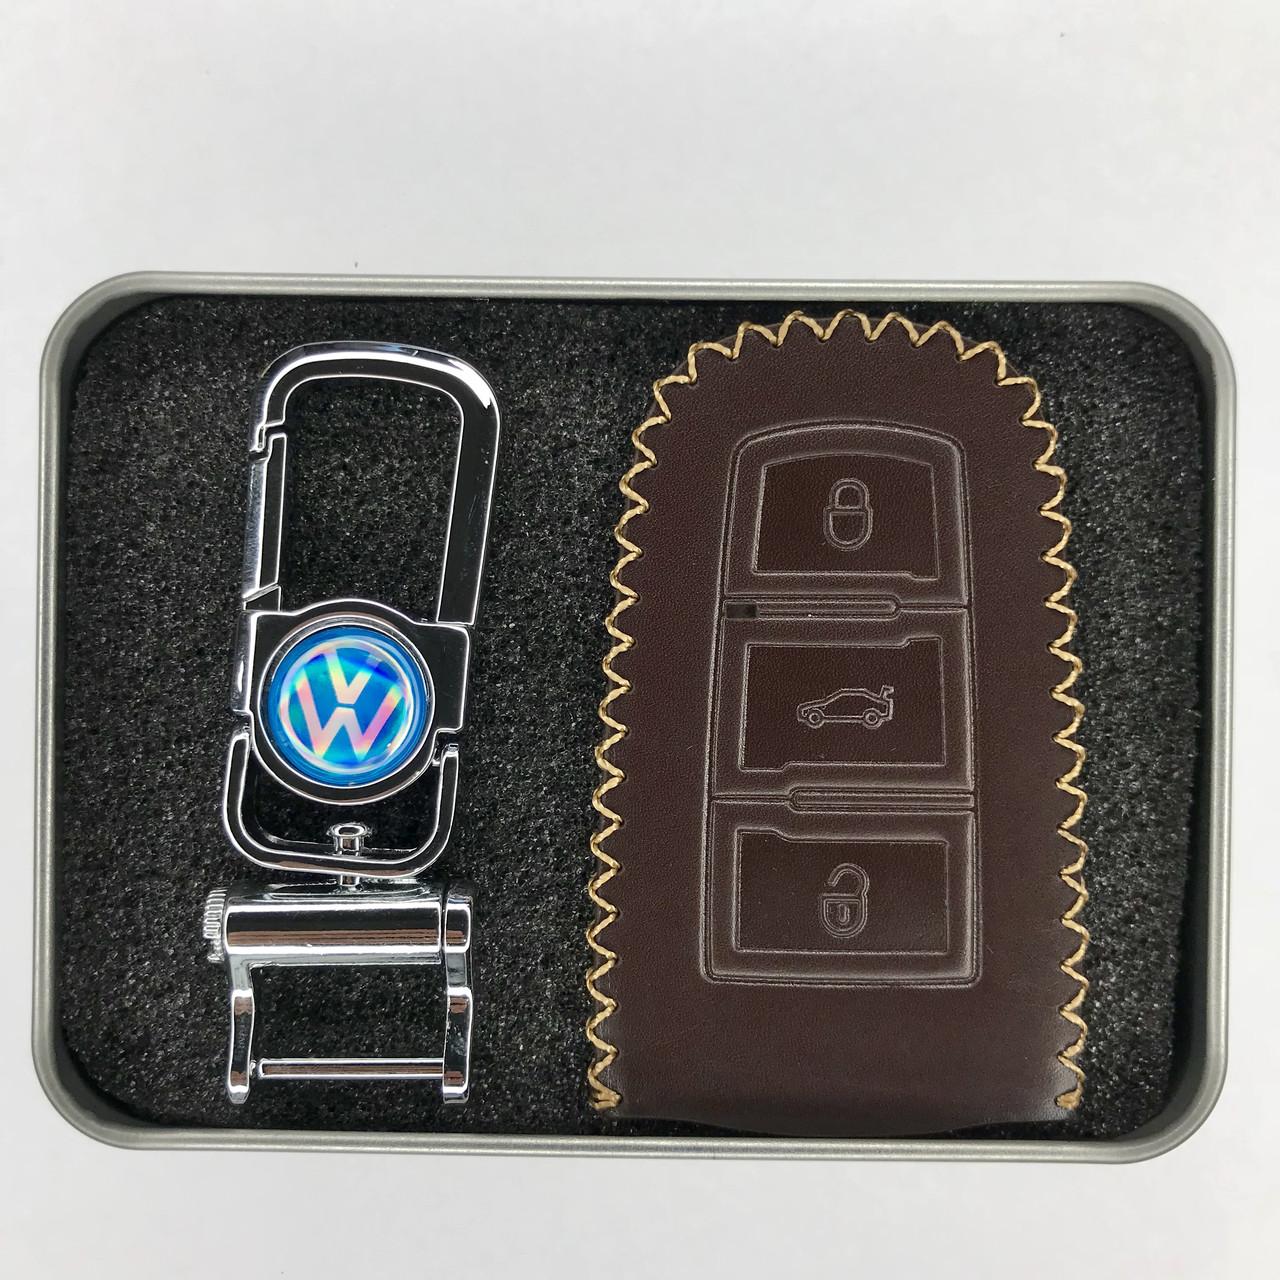 Кожаный чехол для ключа Volkswagen Passat,Golf,Tiguan,Touareg,Polo, Jetta,Amarok,Beetle,Bora,Сaddy,Passat